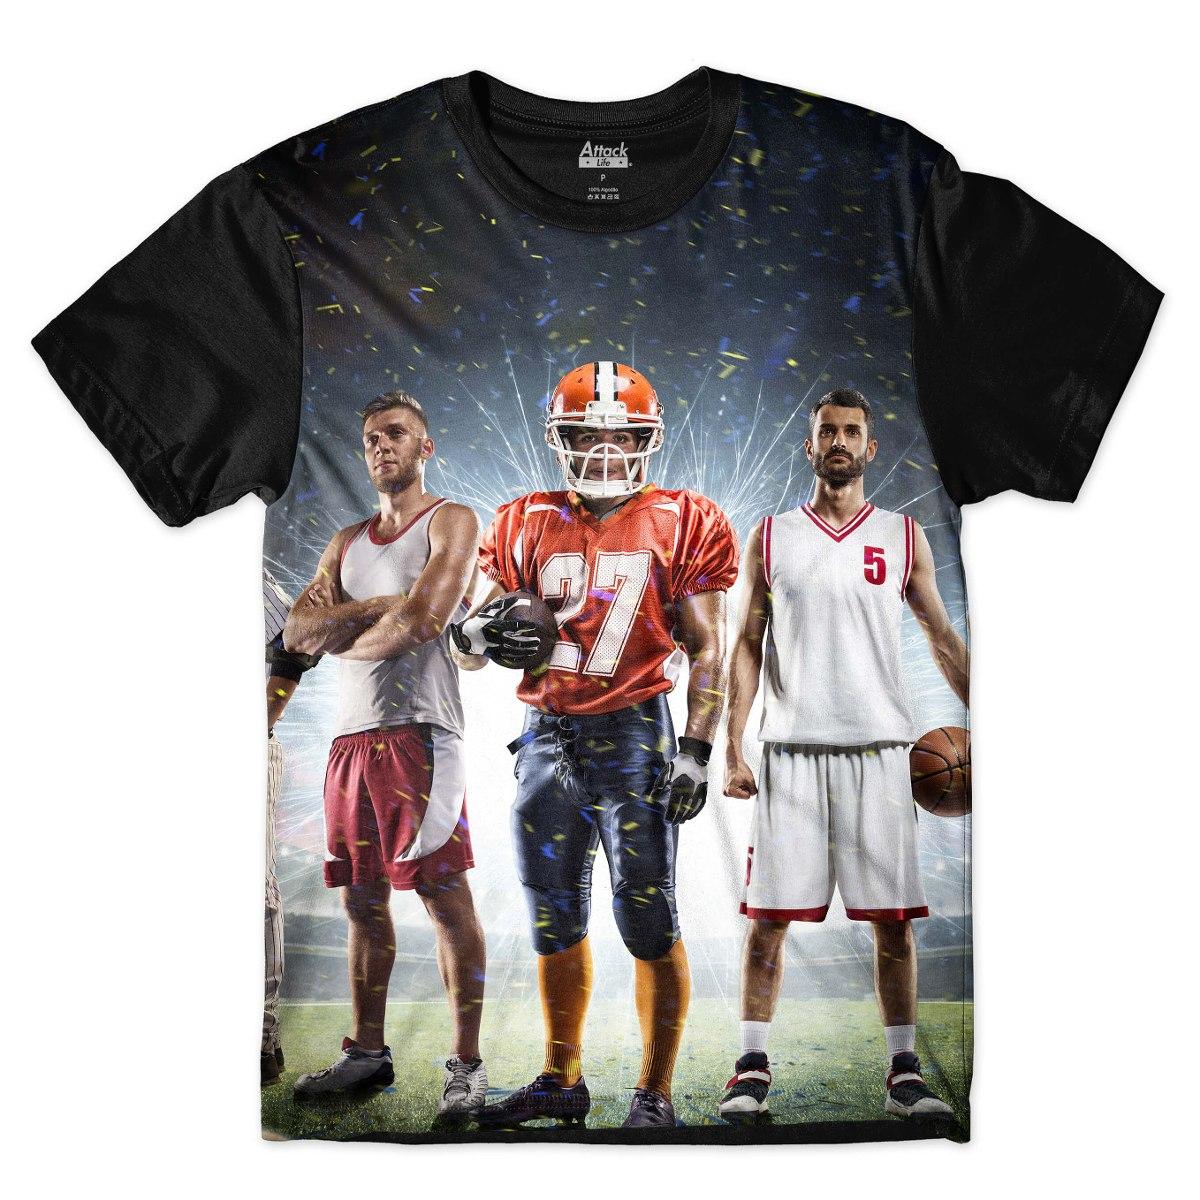 ea967bd53 camisa camiseta nba nfl corrida esporte futebol jogador nhl. Carregando zoom .